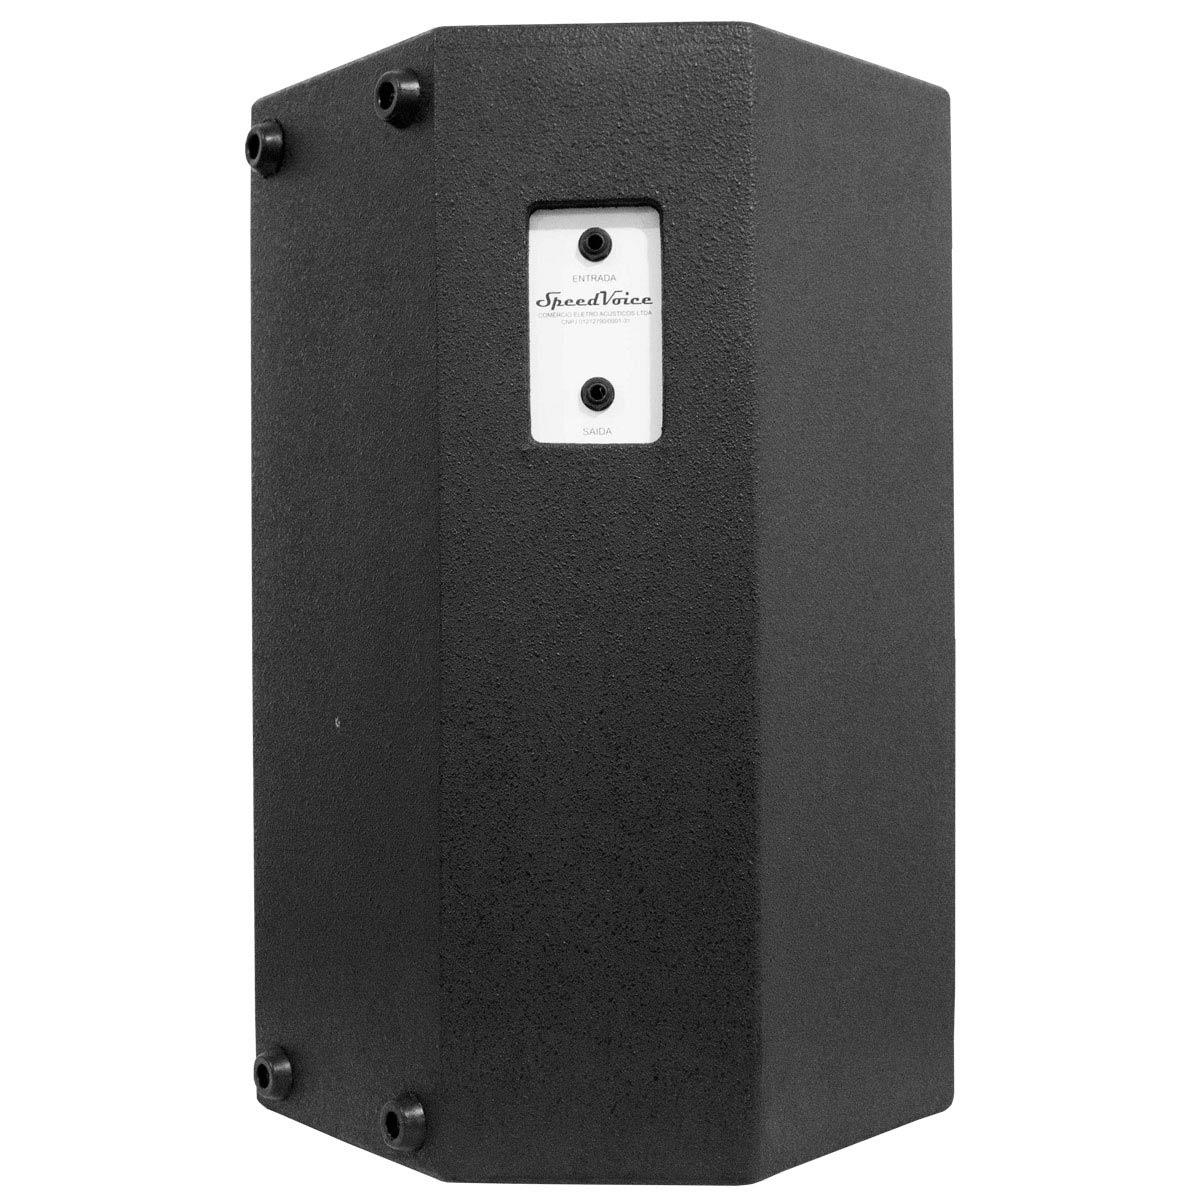 SVX10 - Caixa Passiva 100W SVX 10 - Speed Voice